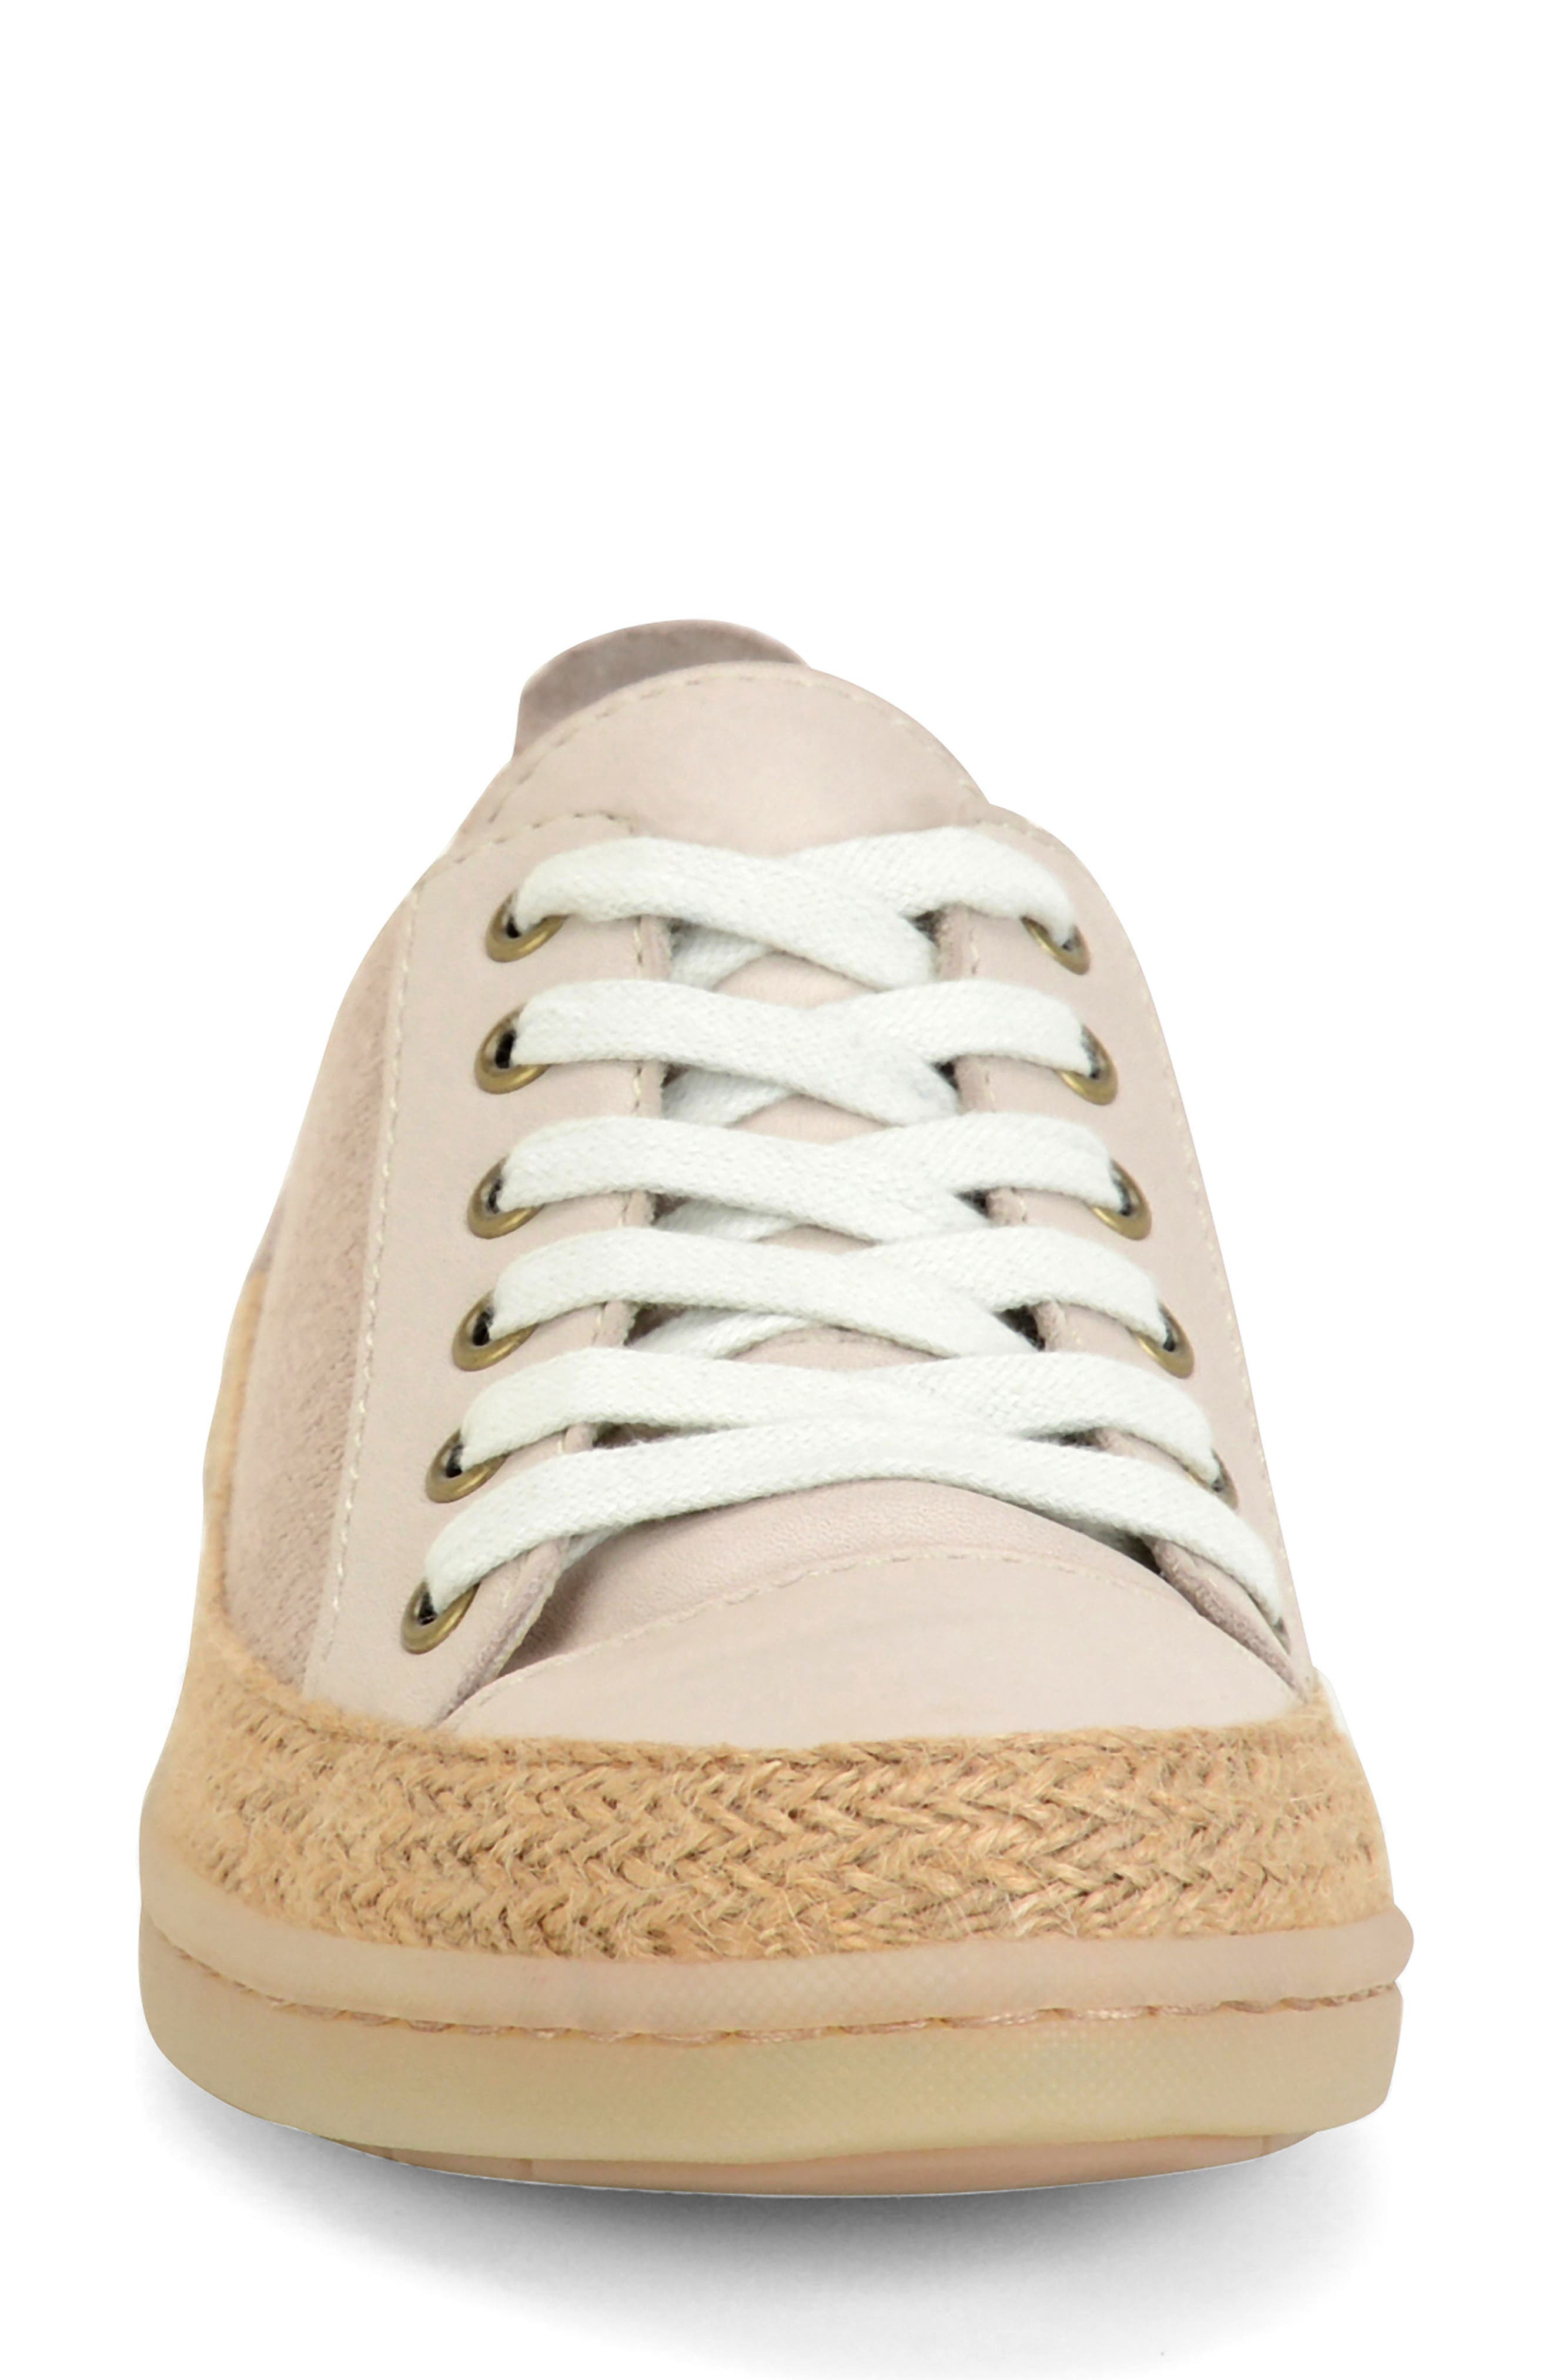 Corfield Sneaker,                             Alternate thumbnail 4, color,                             261